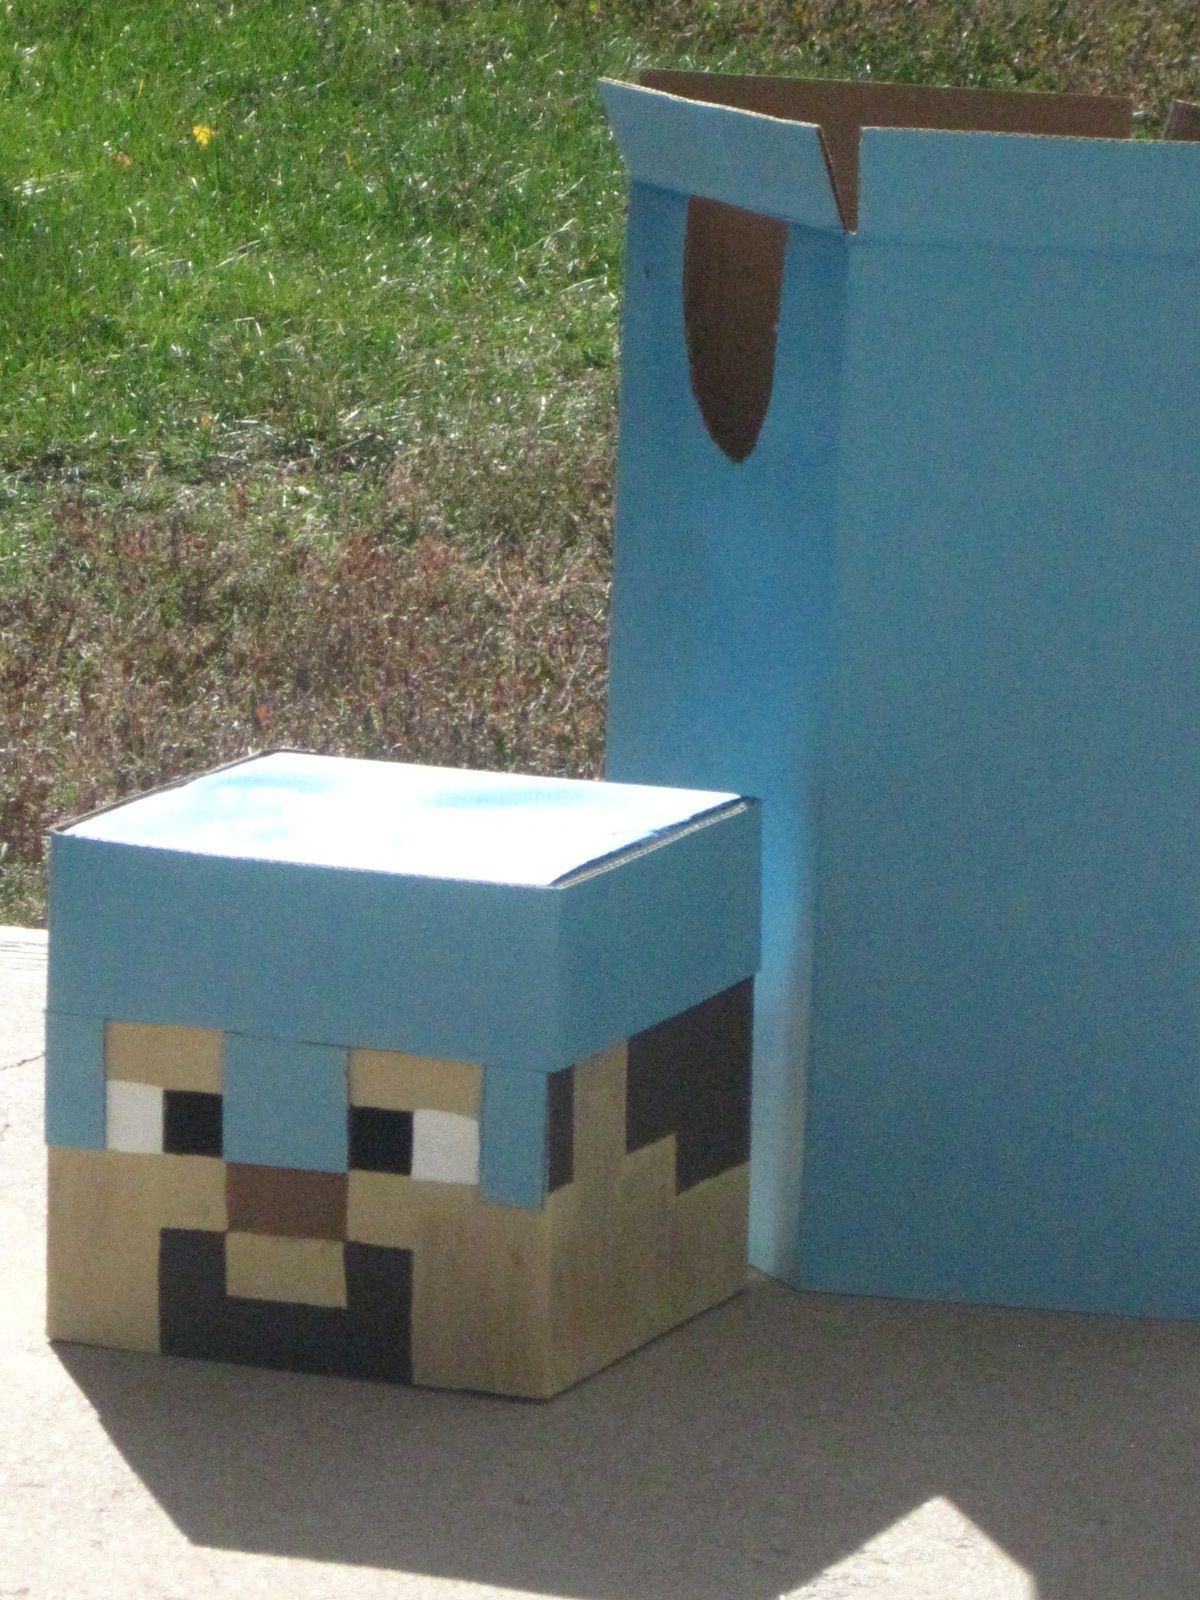 Minecraft Diamond Armor Halloween Costume | minecraft costumes ...